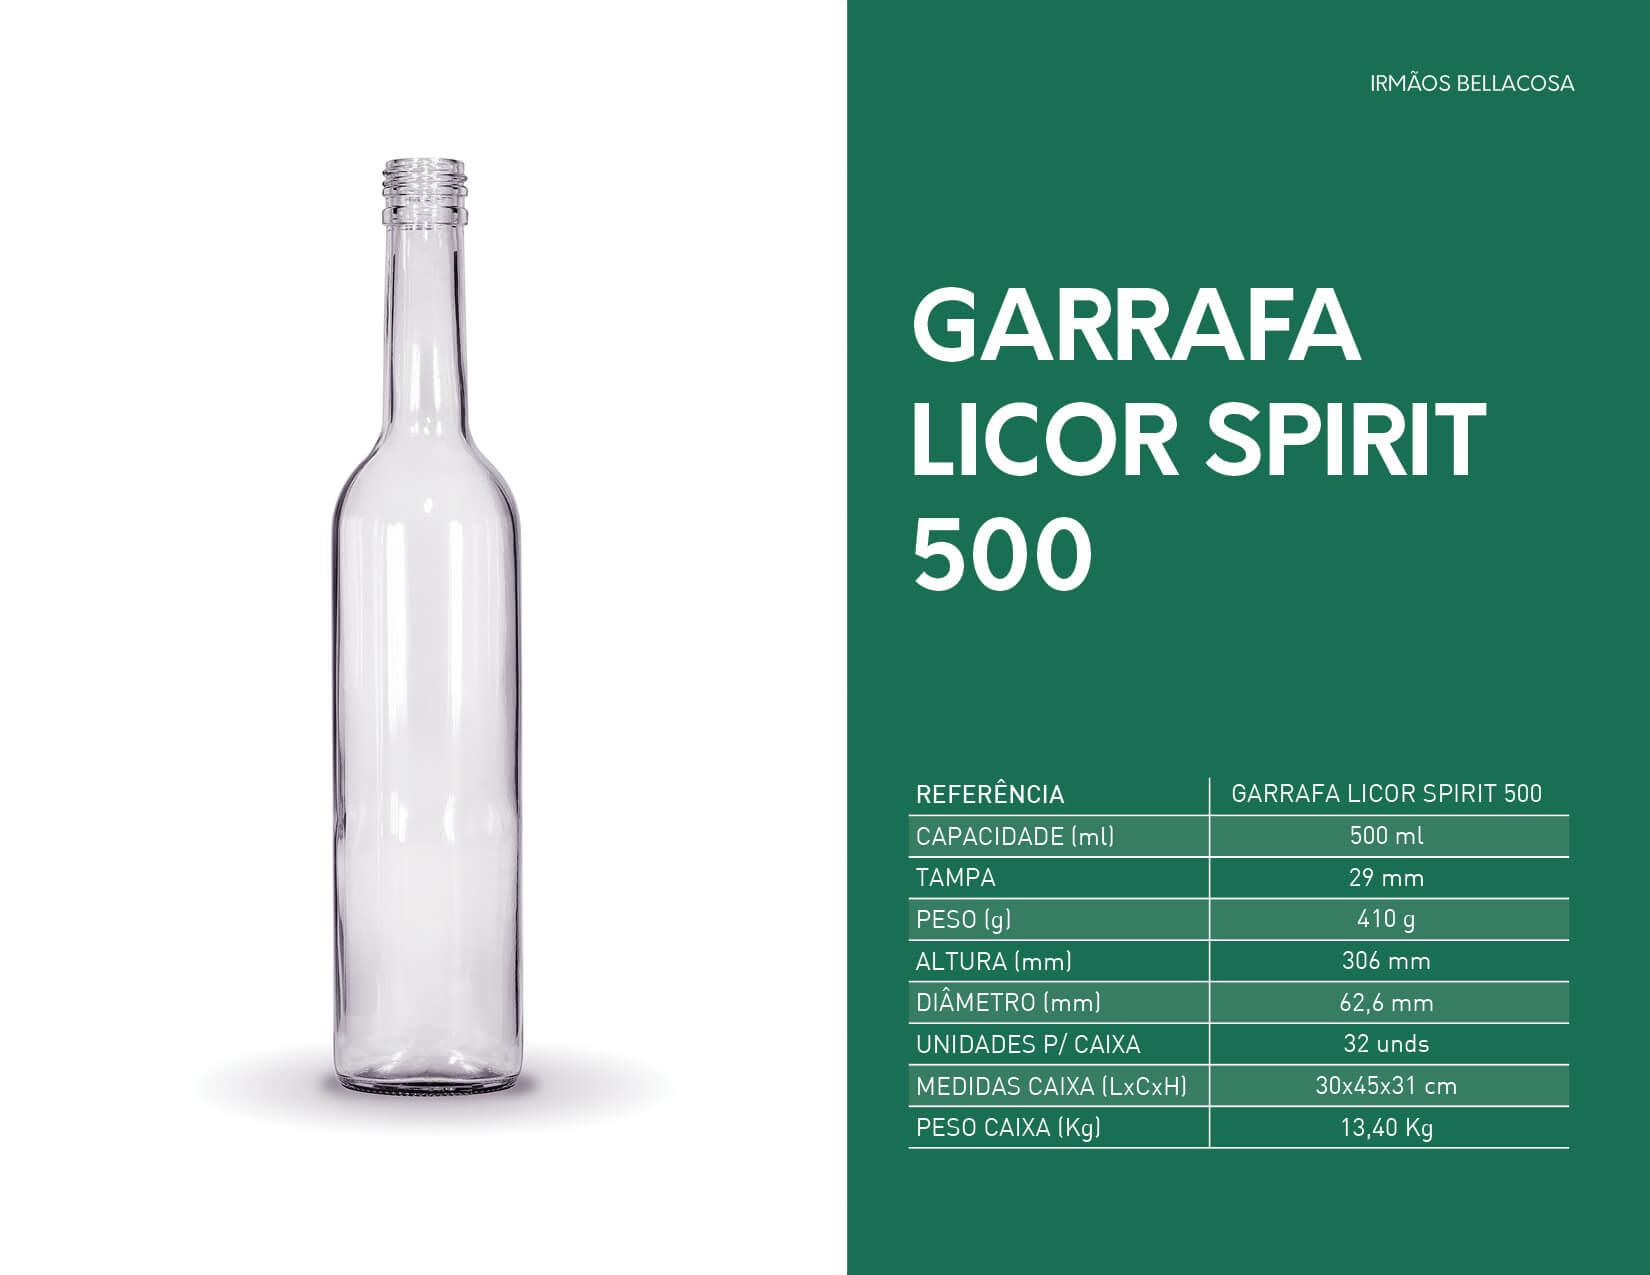 049-Garrafa-licor-Spirit-500-irmaos-bellacosa-embalagens-de-vidro